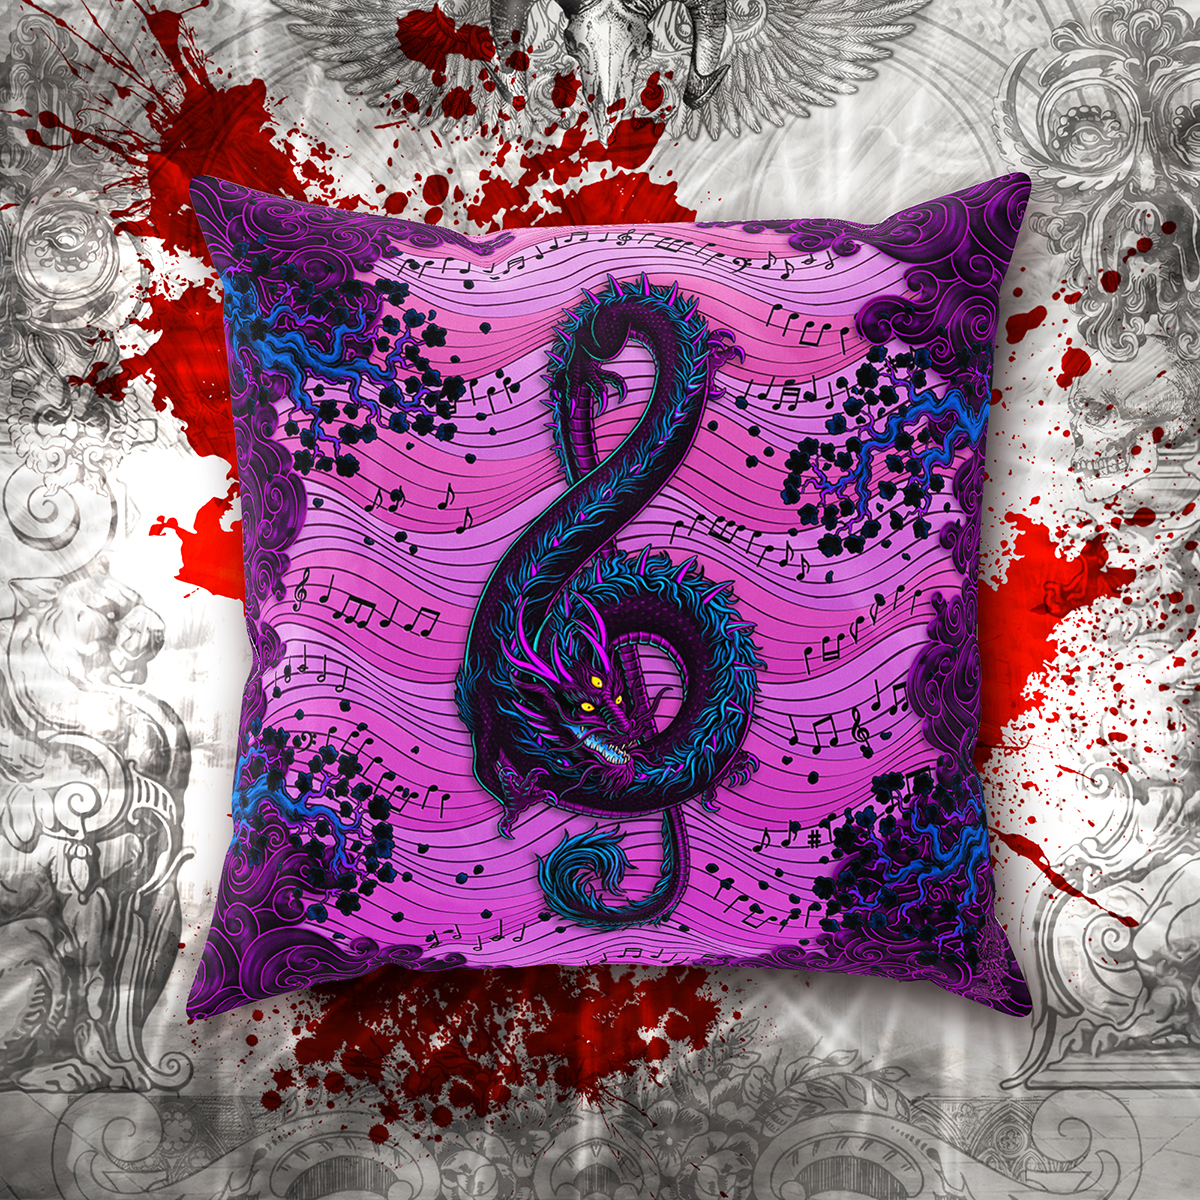 Pastel Goth Music Dragon Pillow Treble Clef Gothic Home Decor Throw Pillow Case On Storenvy Ibt Shop